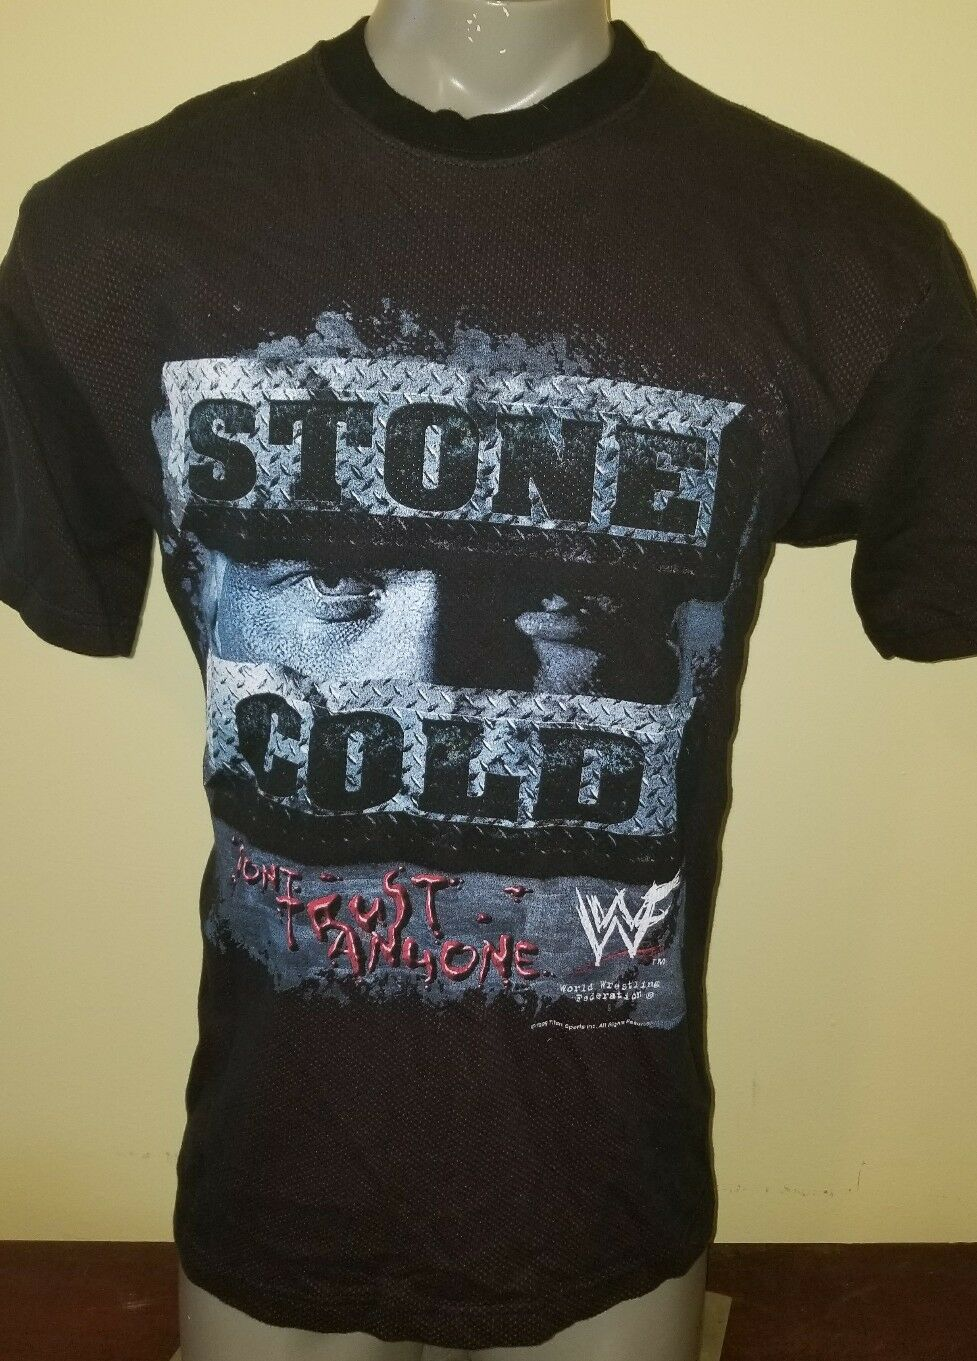 Vtg NOS Large Stone Cold Steve Austin DTA shirt vintage WWF WWE WCW ECW 1999